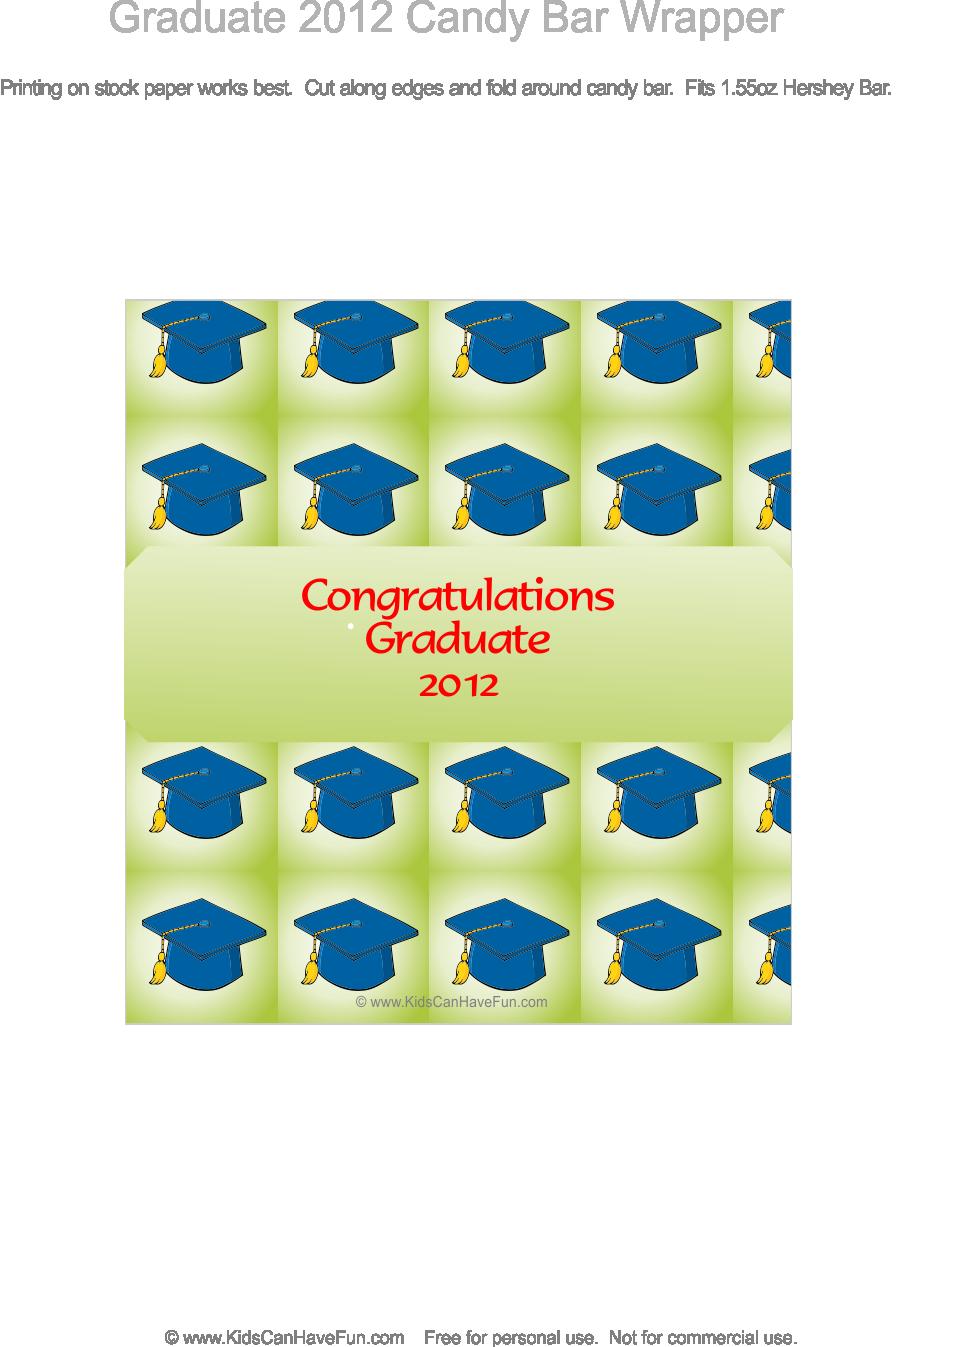 Graduate clipart school farewell. Candy bar wrapper graduation